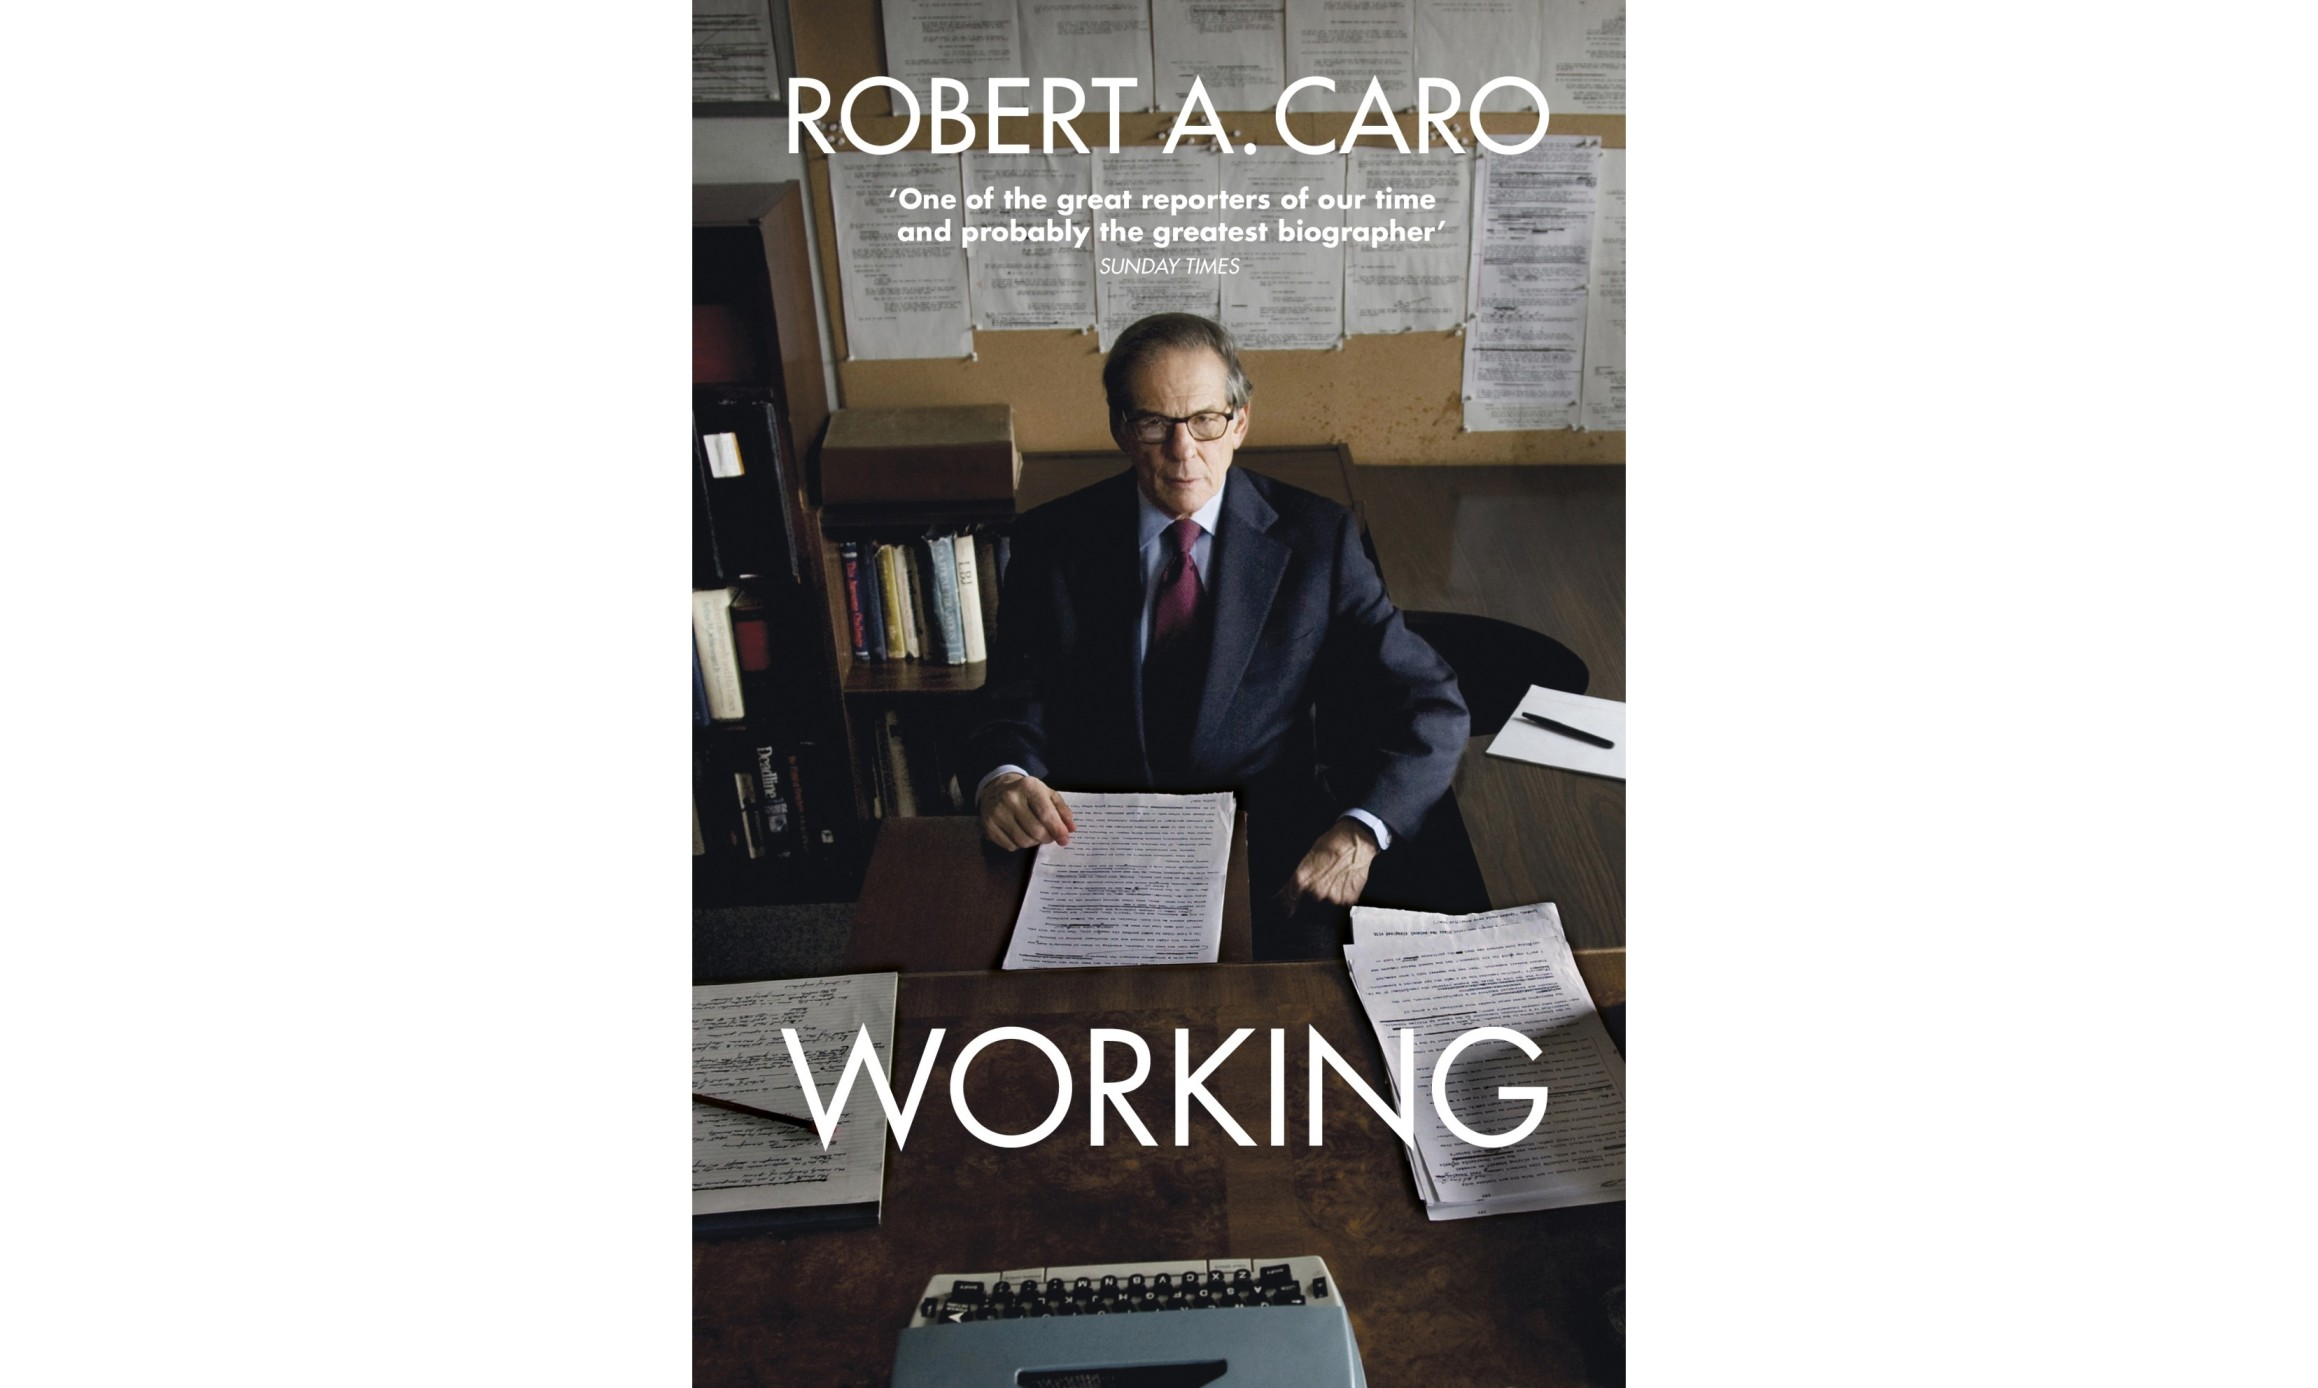 Robert Caro Working.jpg